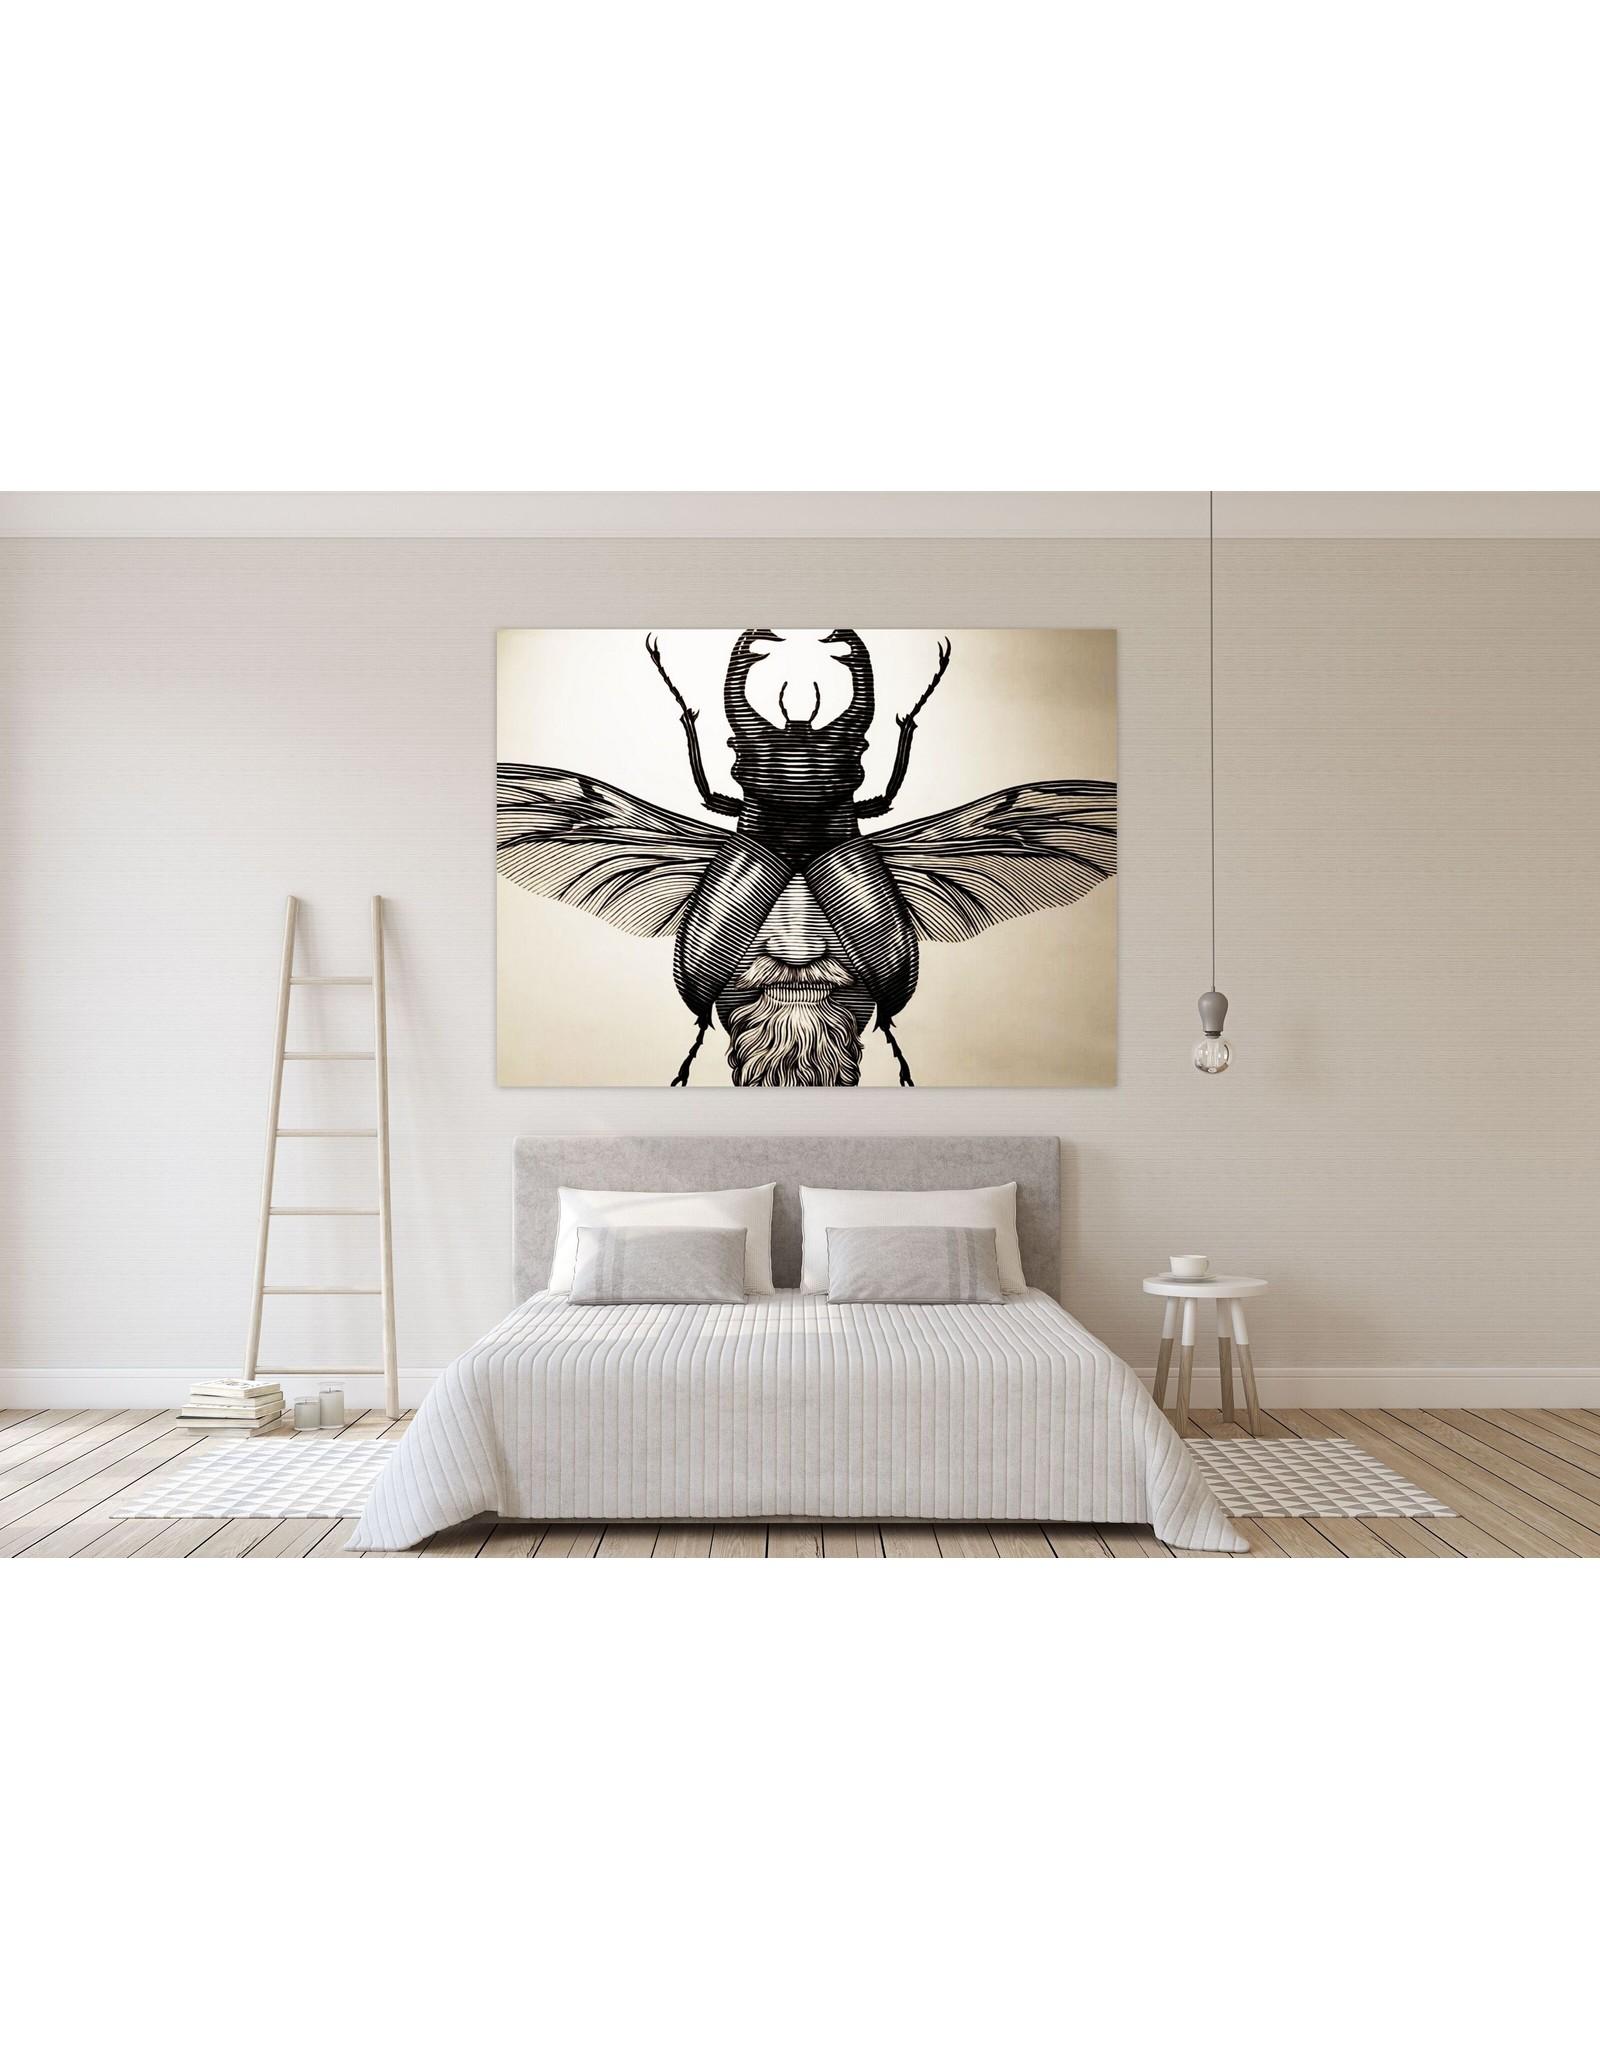 Nicolas Alfalfa Nicolas Alfalfa - King of Beetles